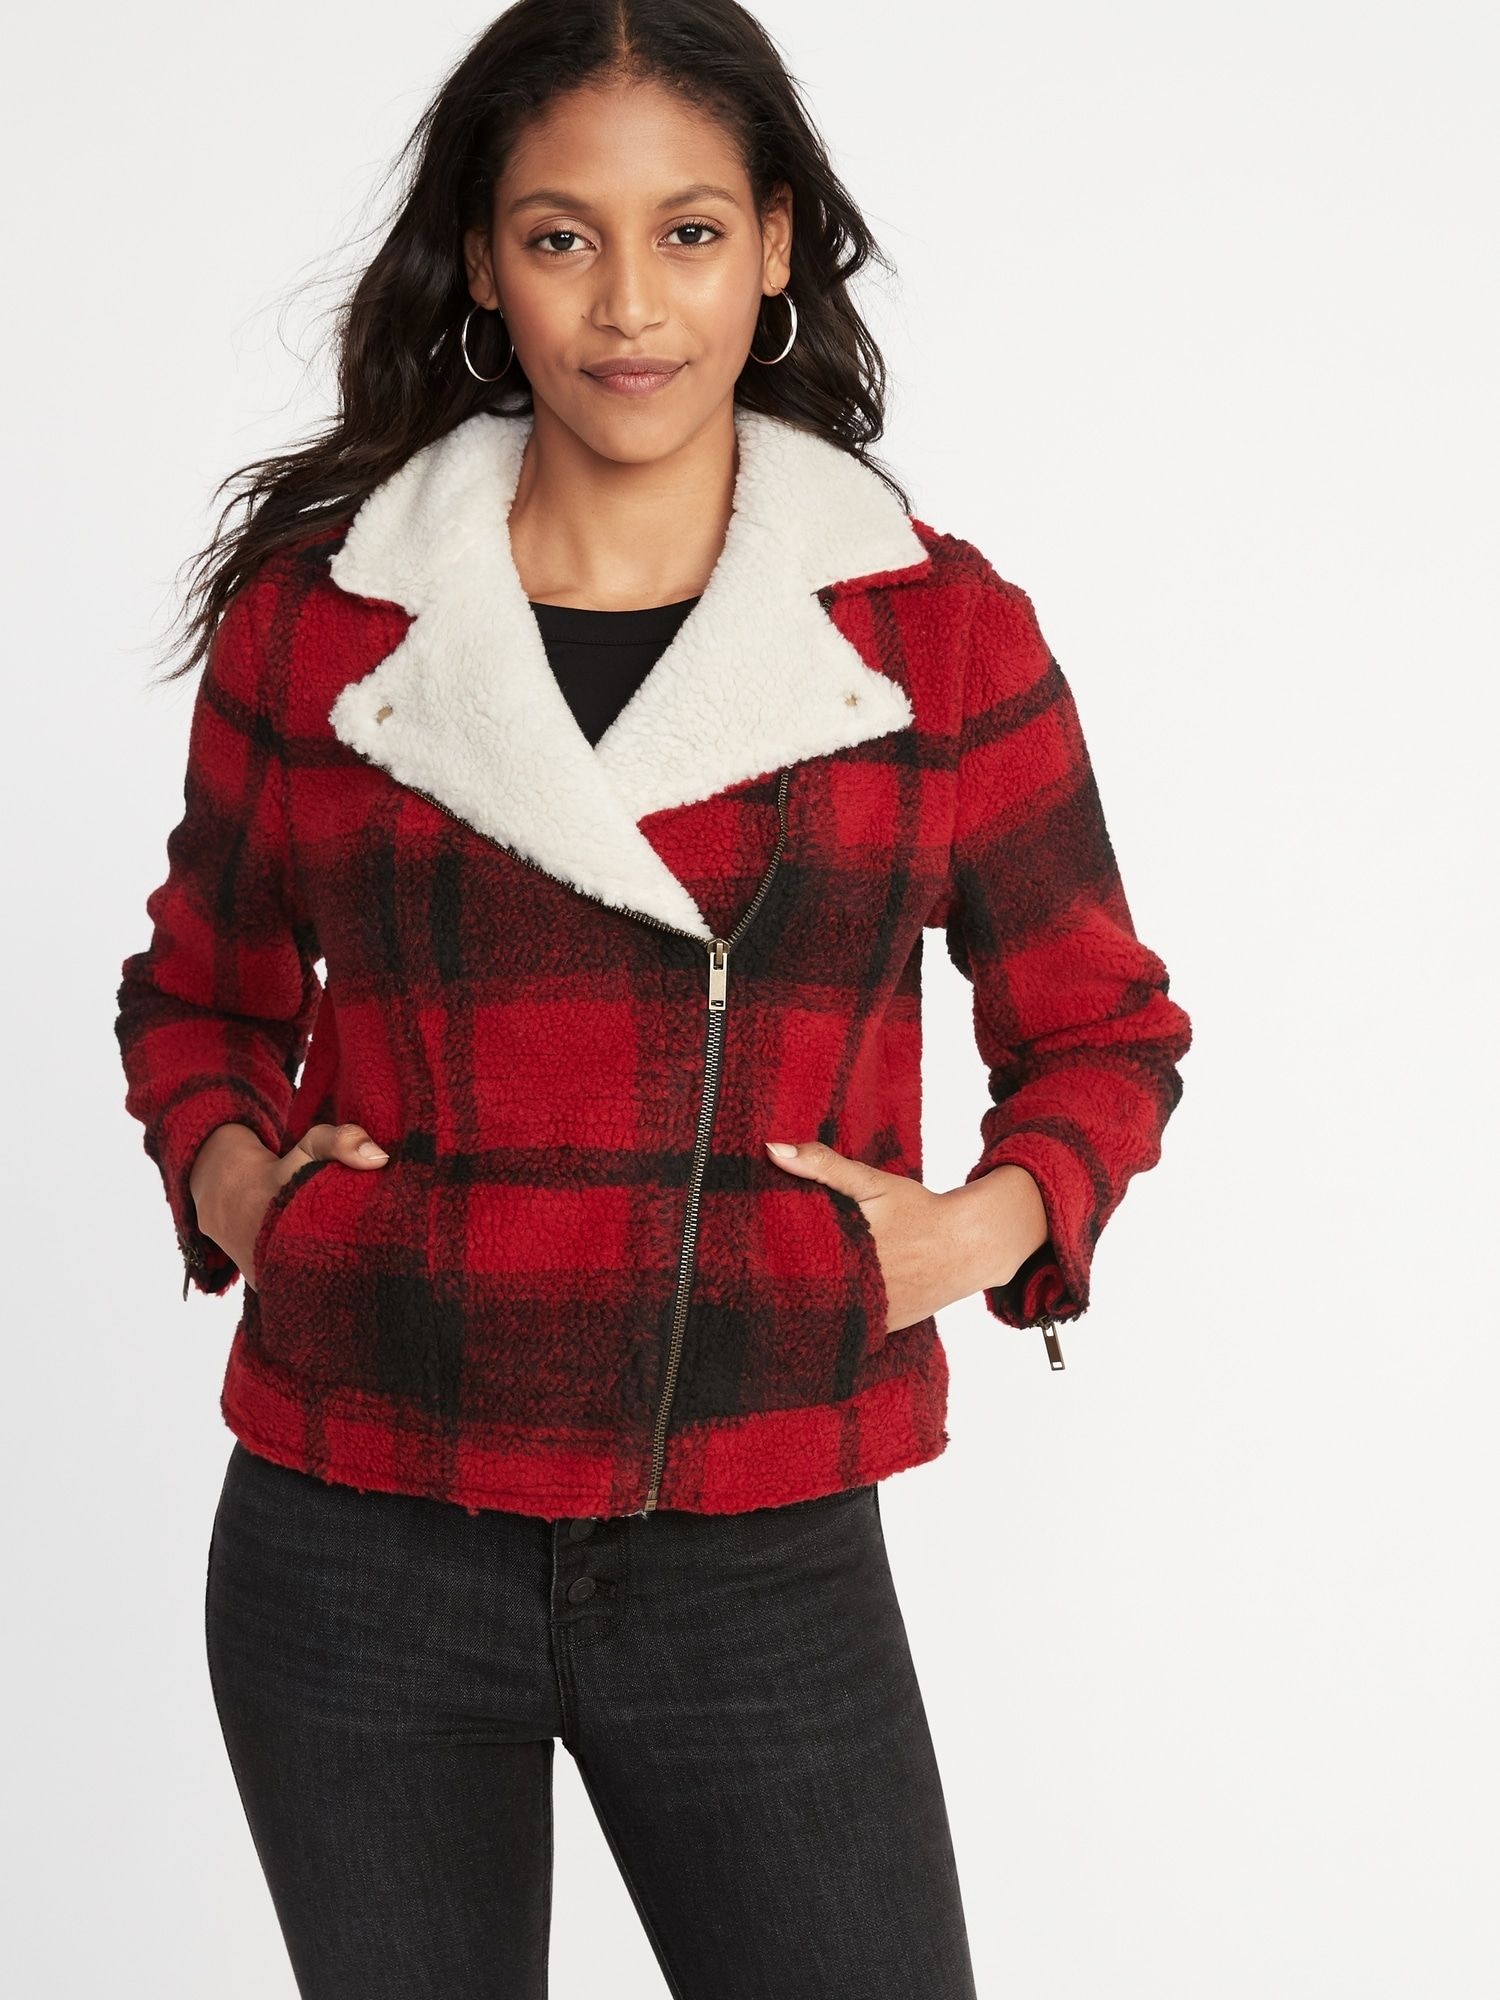 Plaid Sherpa Moto Jacket (With images) Fall fashion